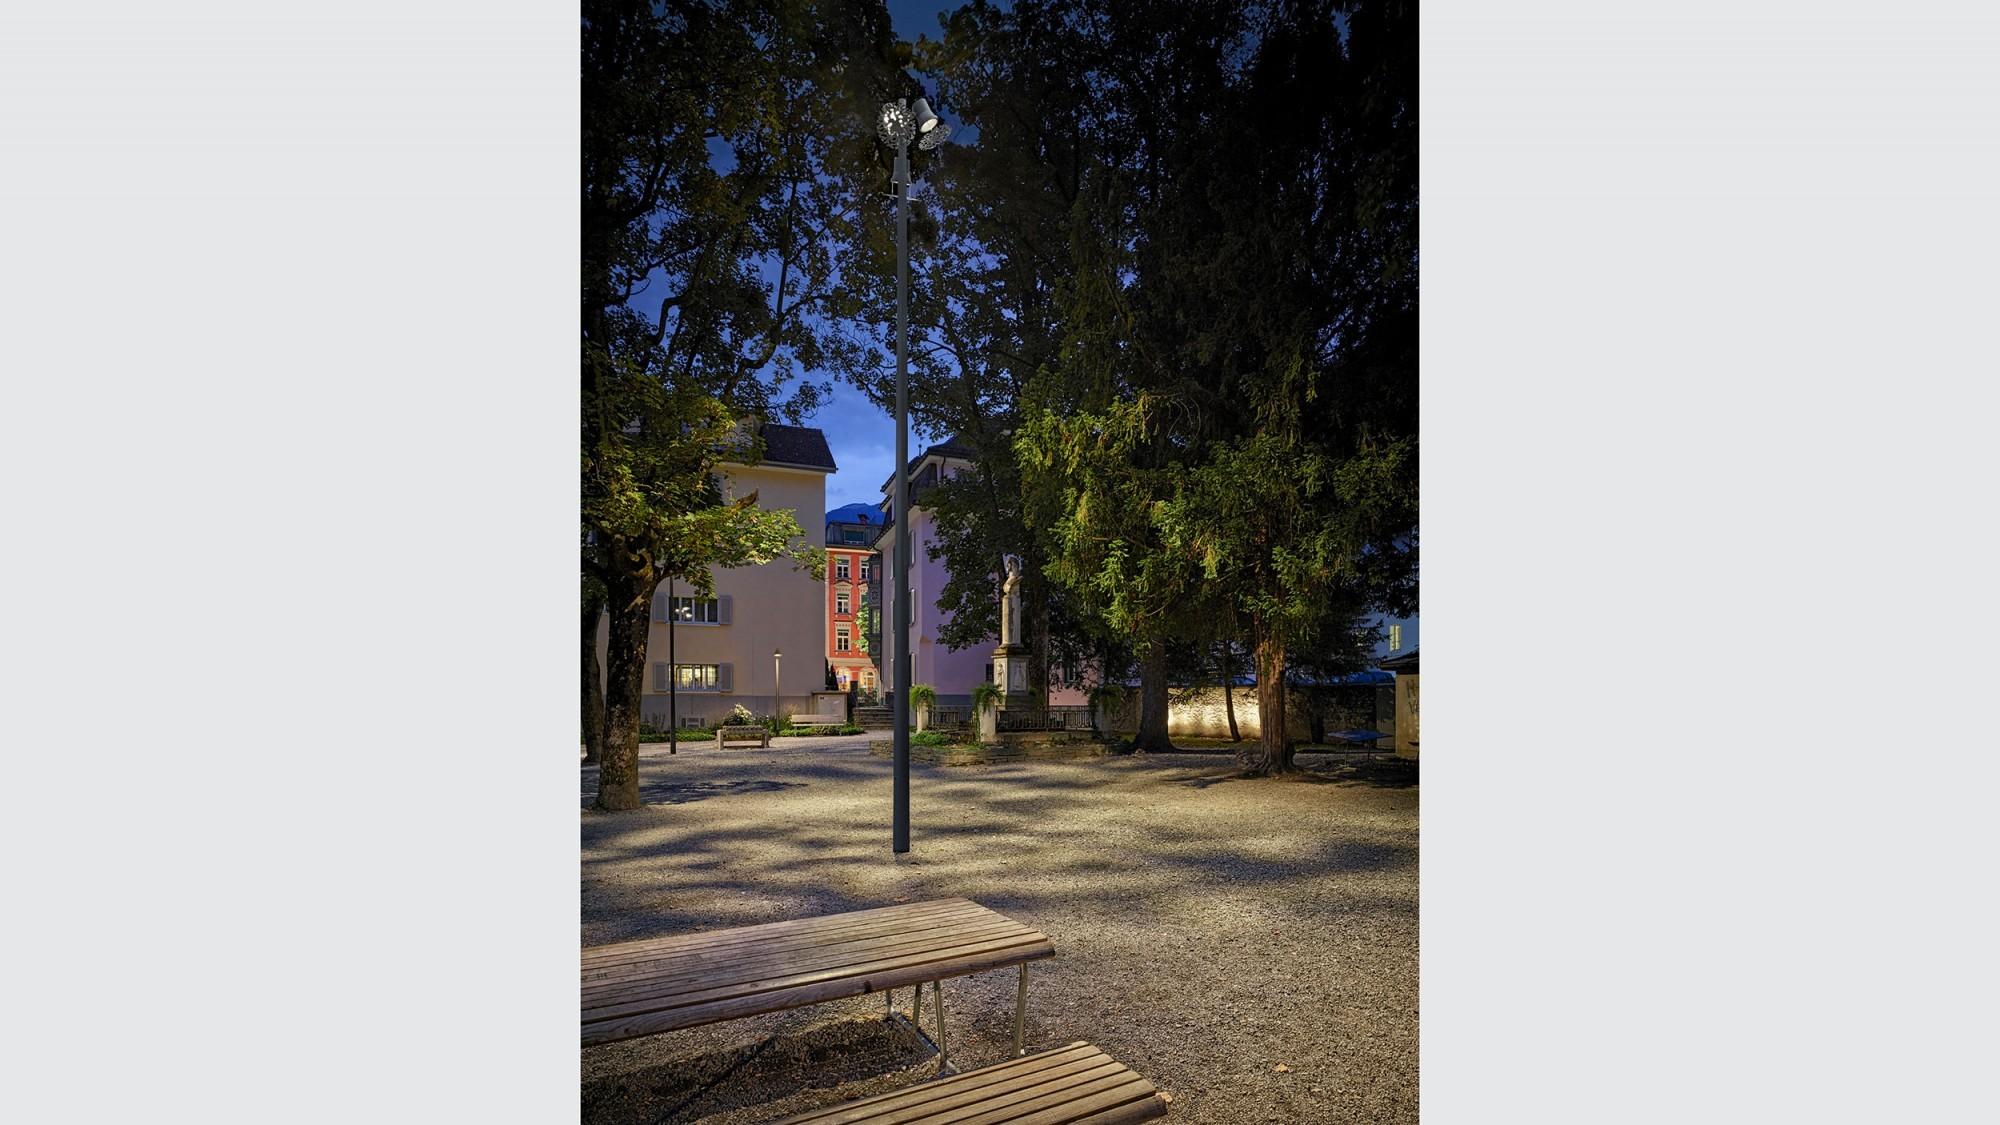 Stadtgarten Chur